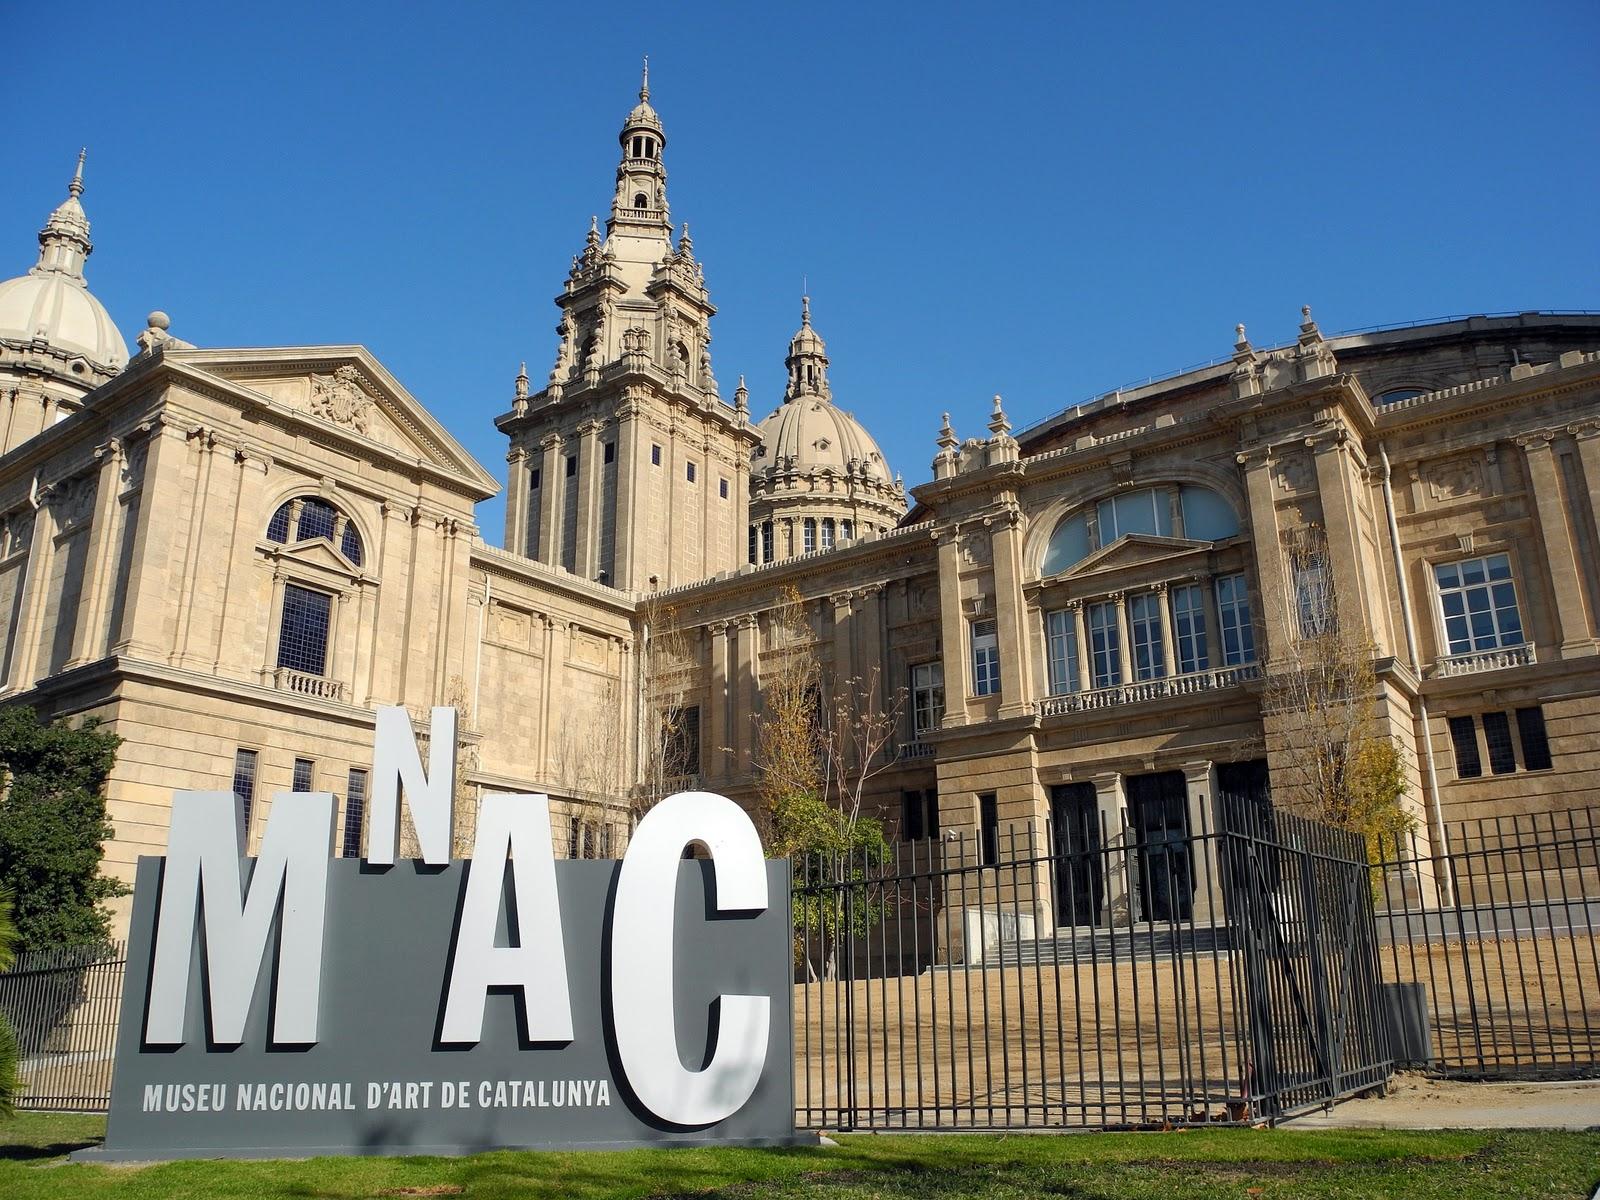 museu-nacional-dart-de-catalunya-in-barcelona-spain